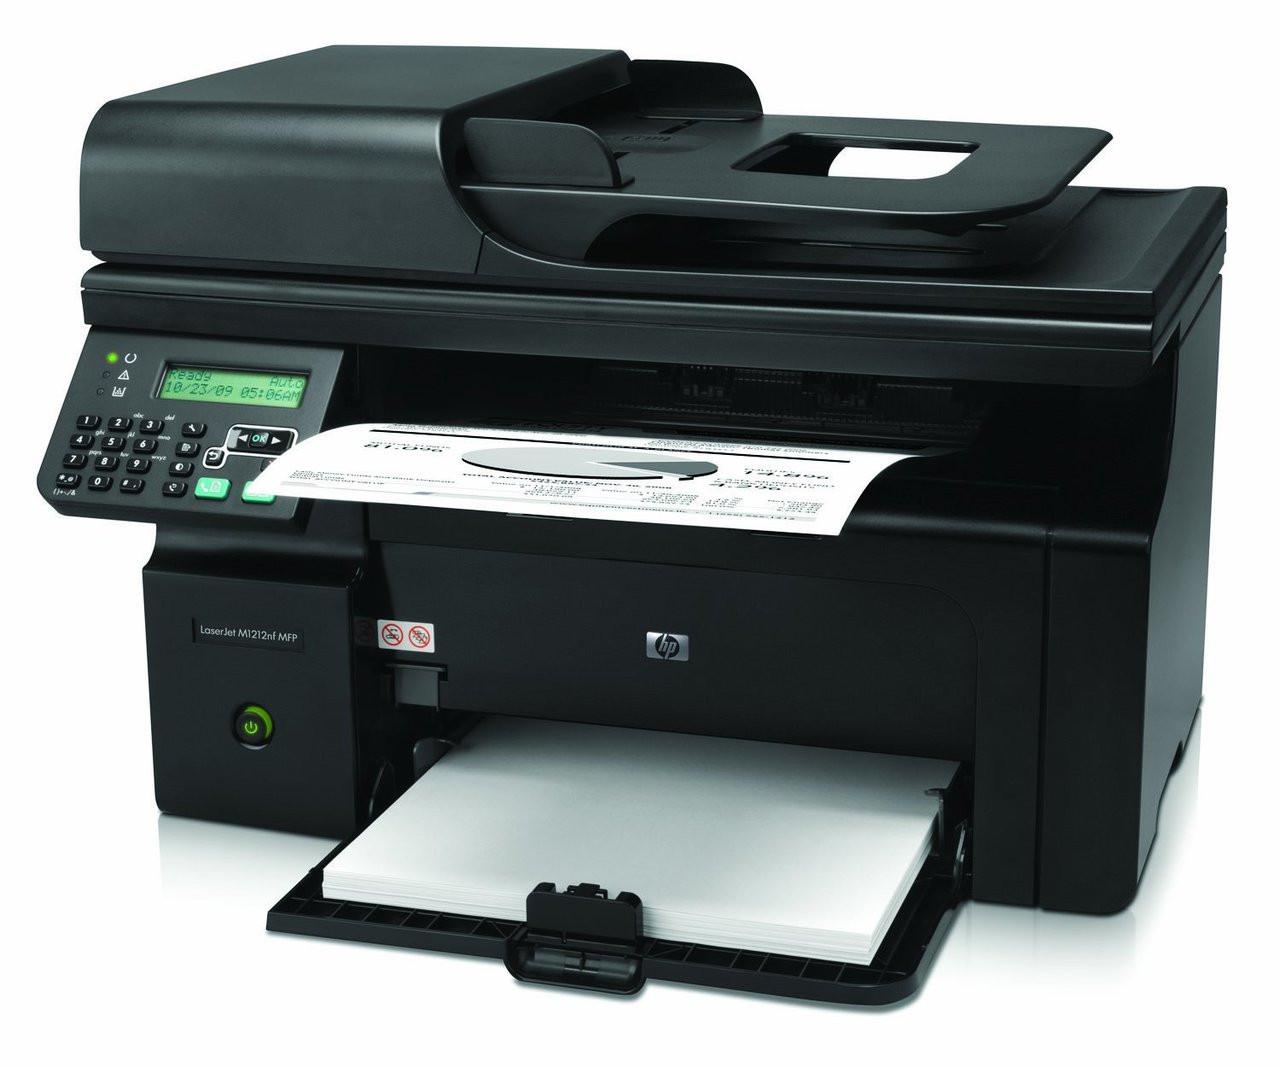 HP LaserJet Pro M1212nf MFP - CE841A - HP Laser Printer for sale